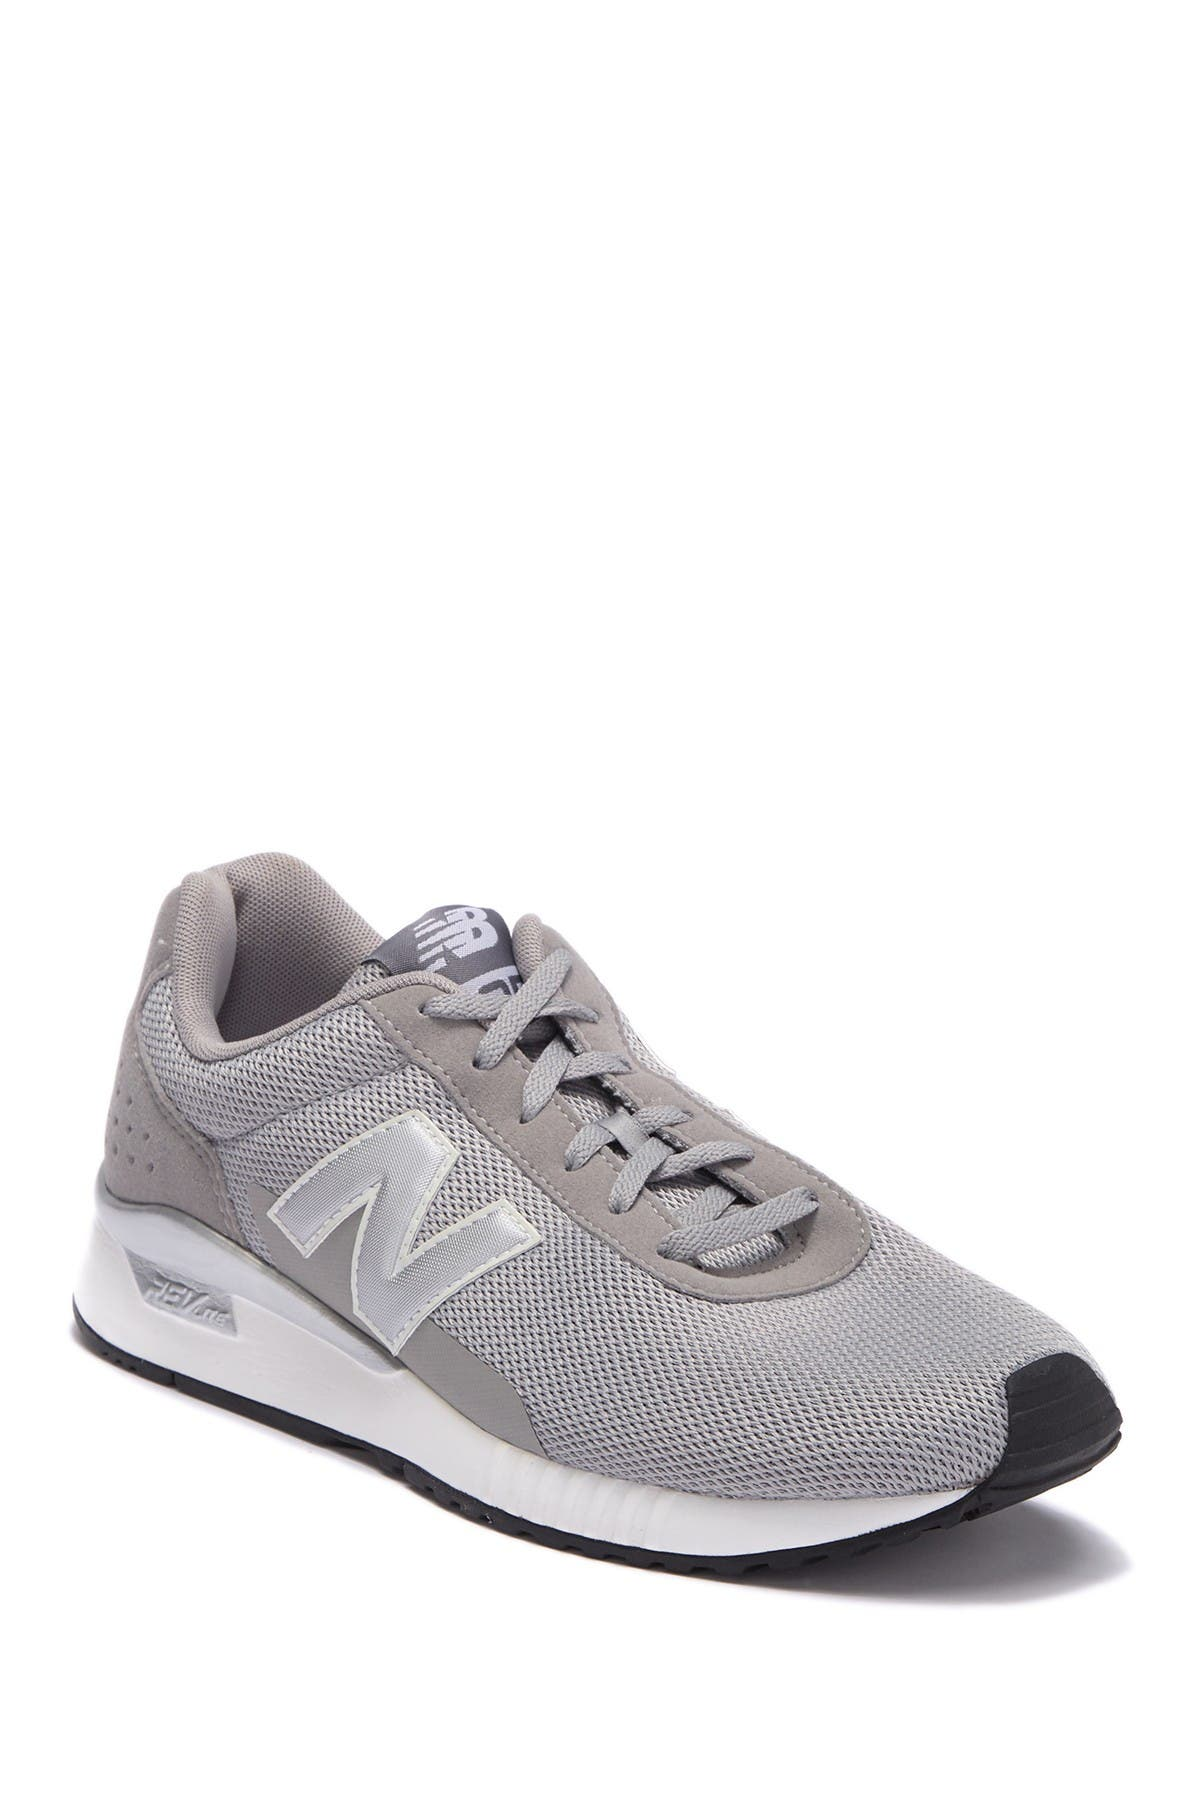 New Balance   005 Running Sneaker   HauteLook